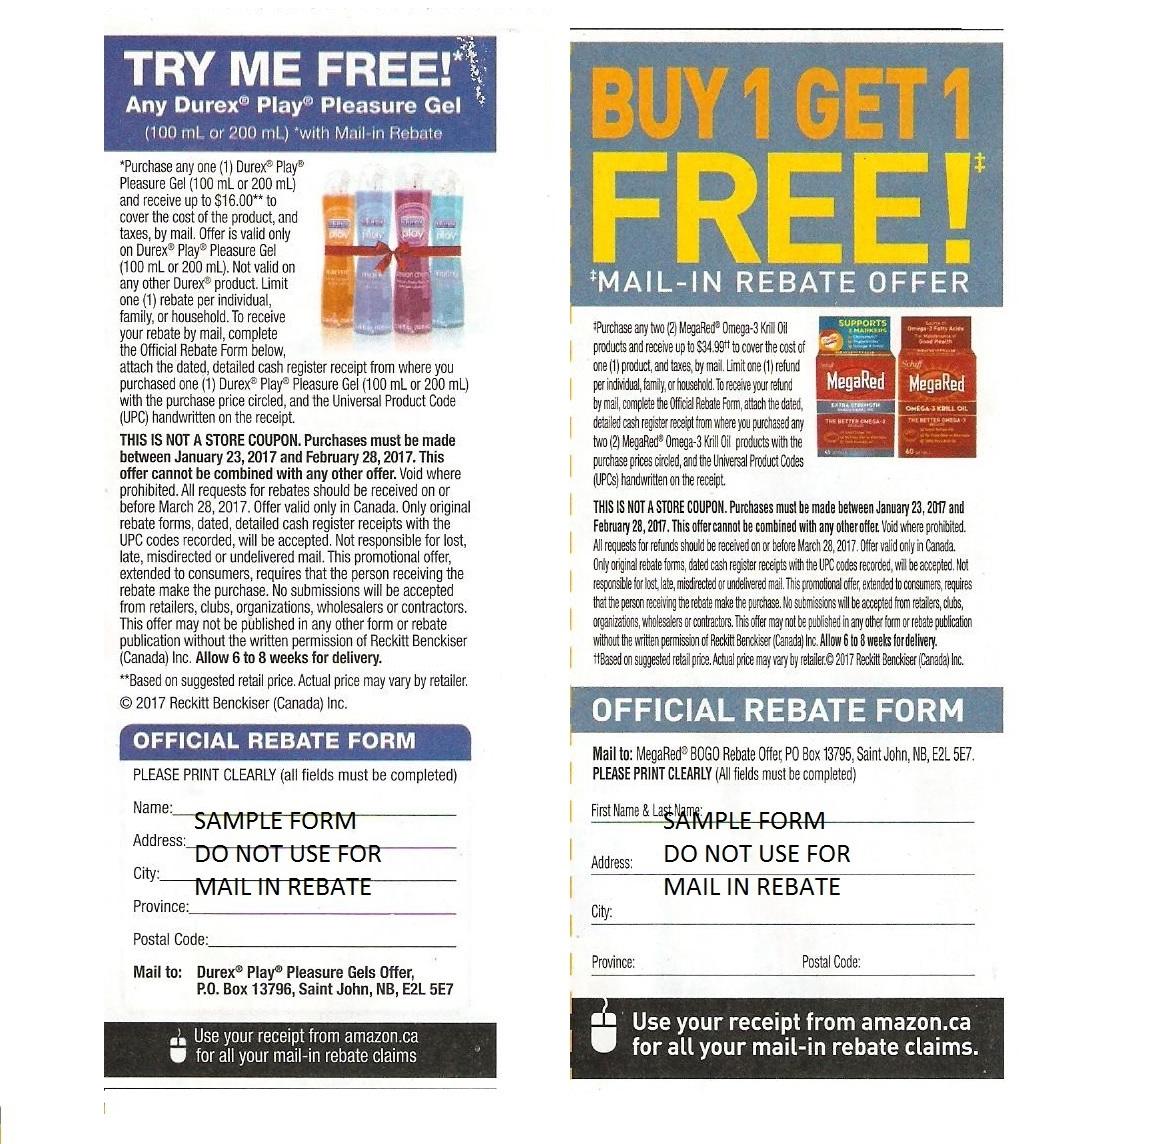 Magazine coupon dimensions